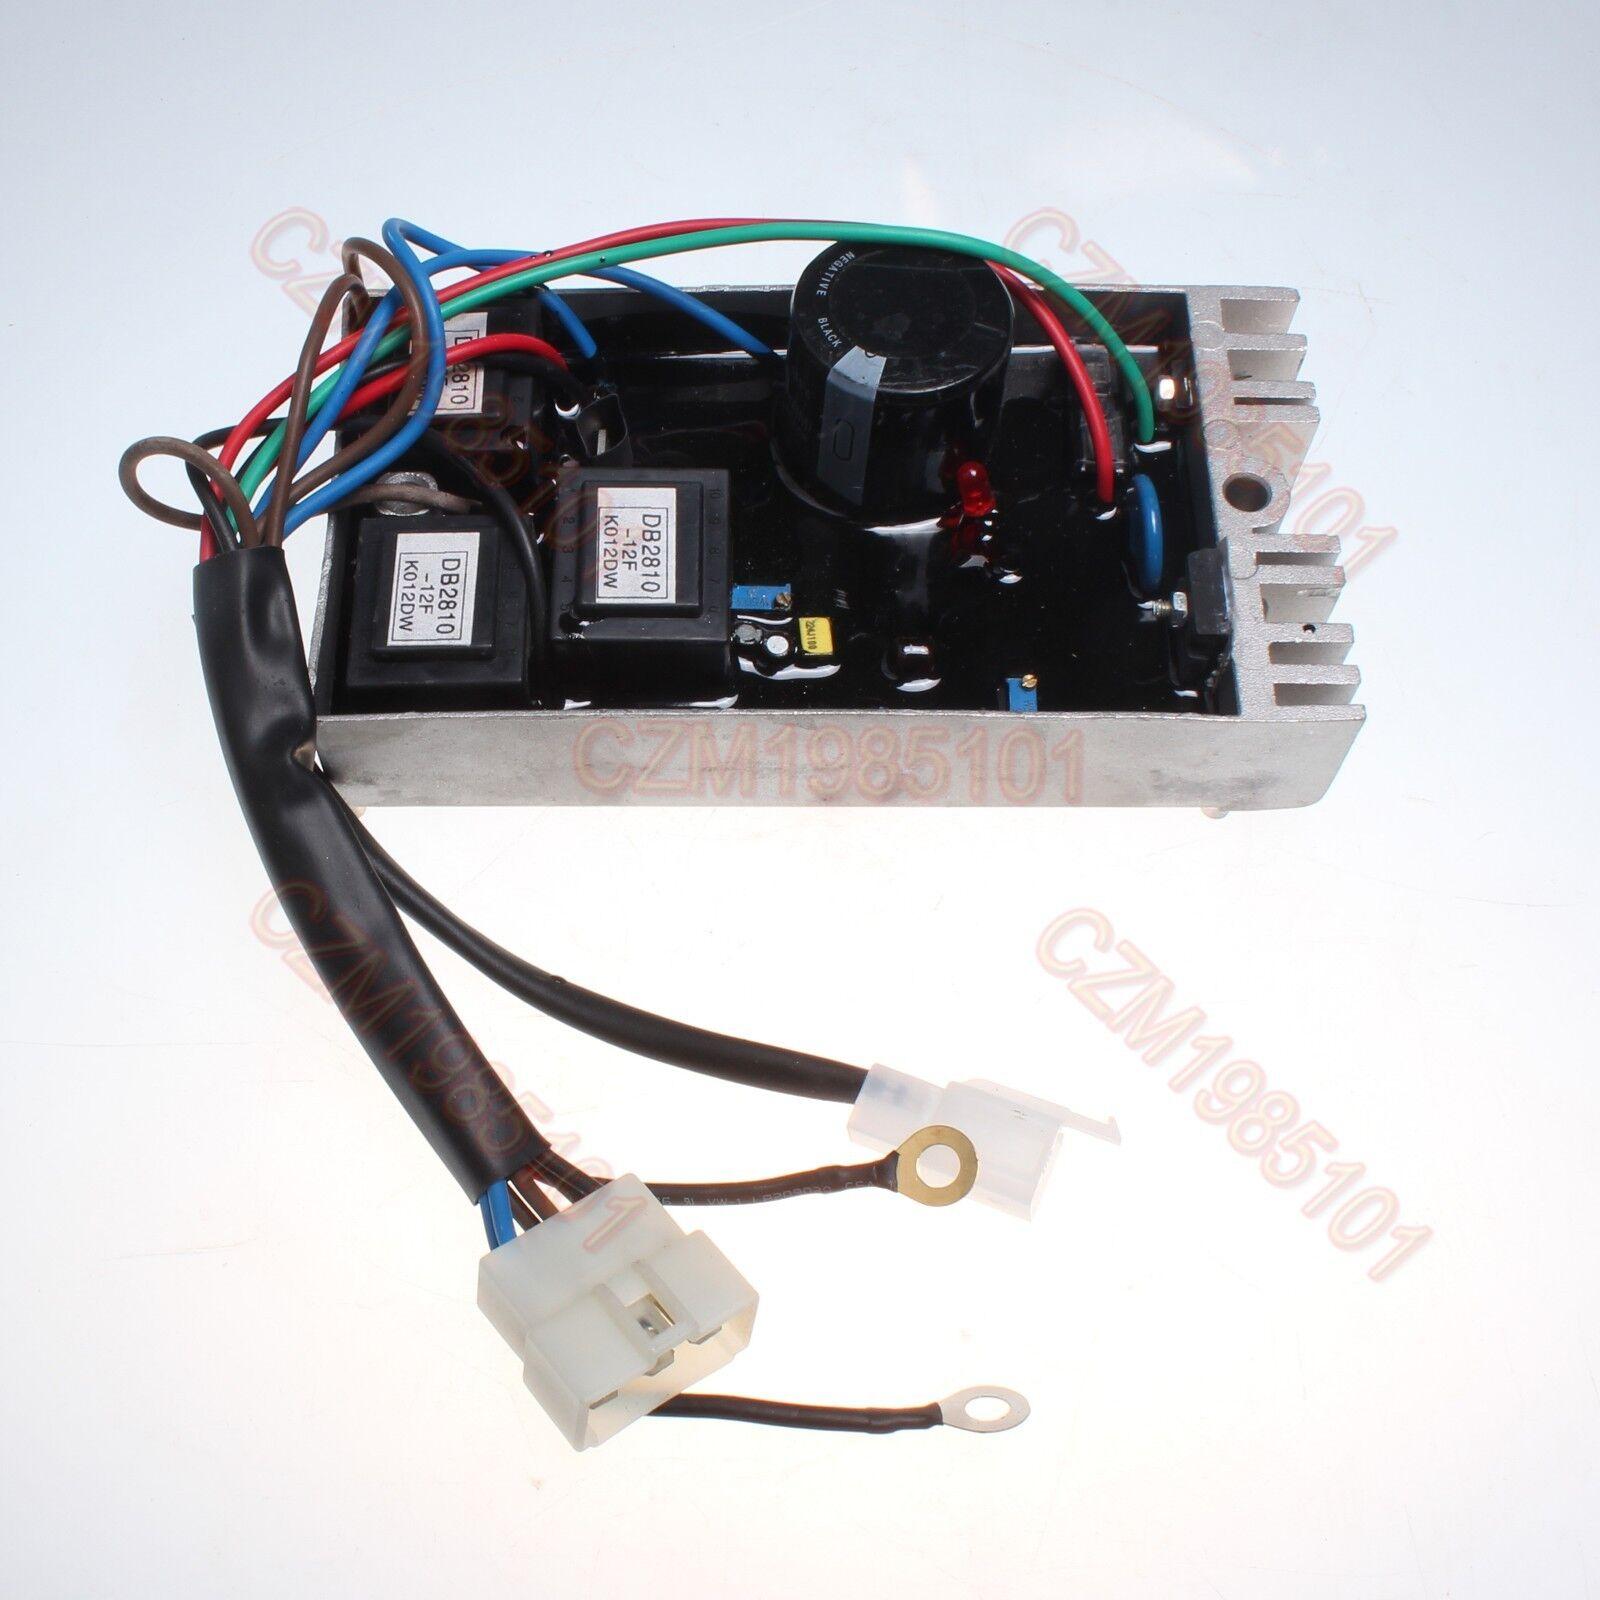 Voltage Regulator Ki Davr 150s3 For Kipor Kama 12 15 Kw Three Phases Wiring Diagram Generator